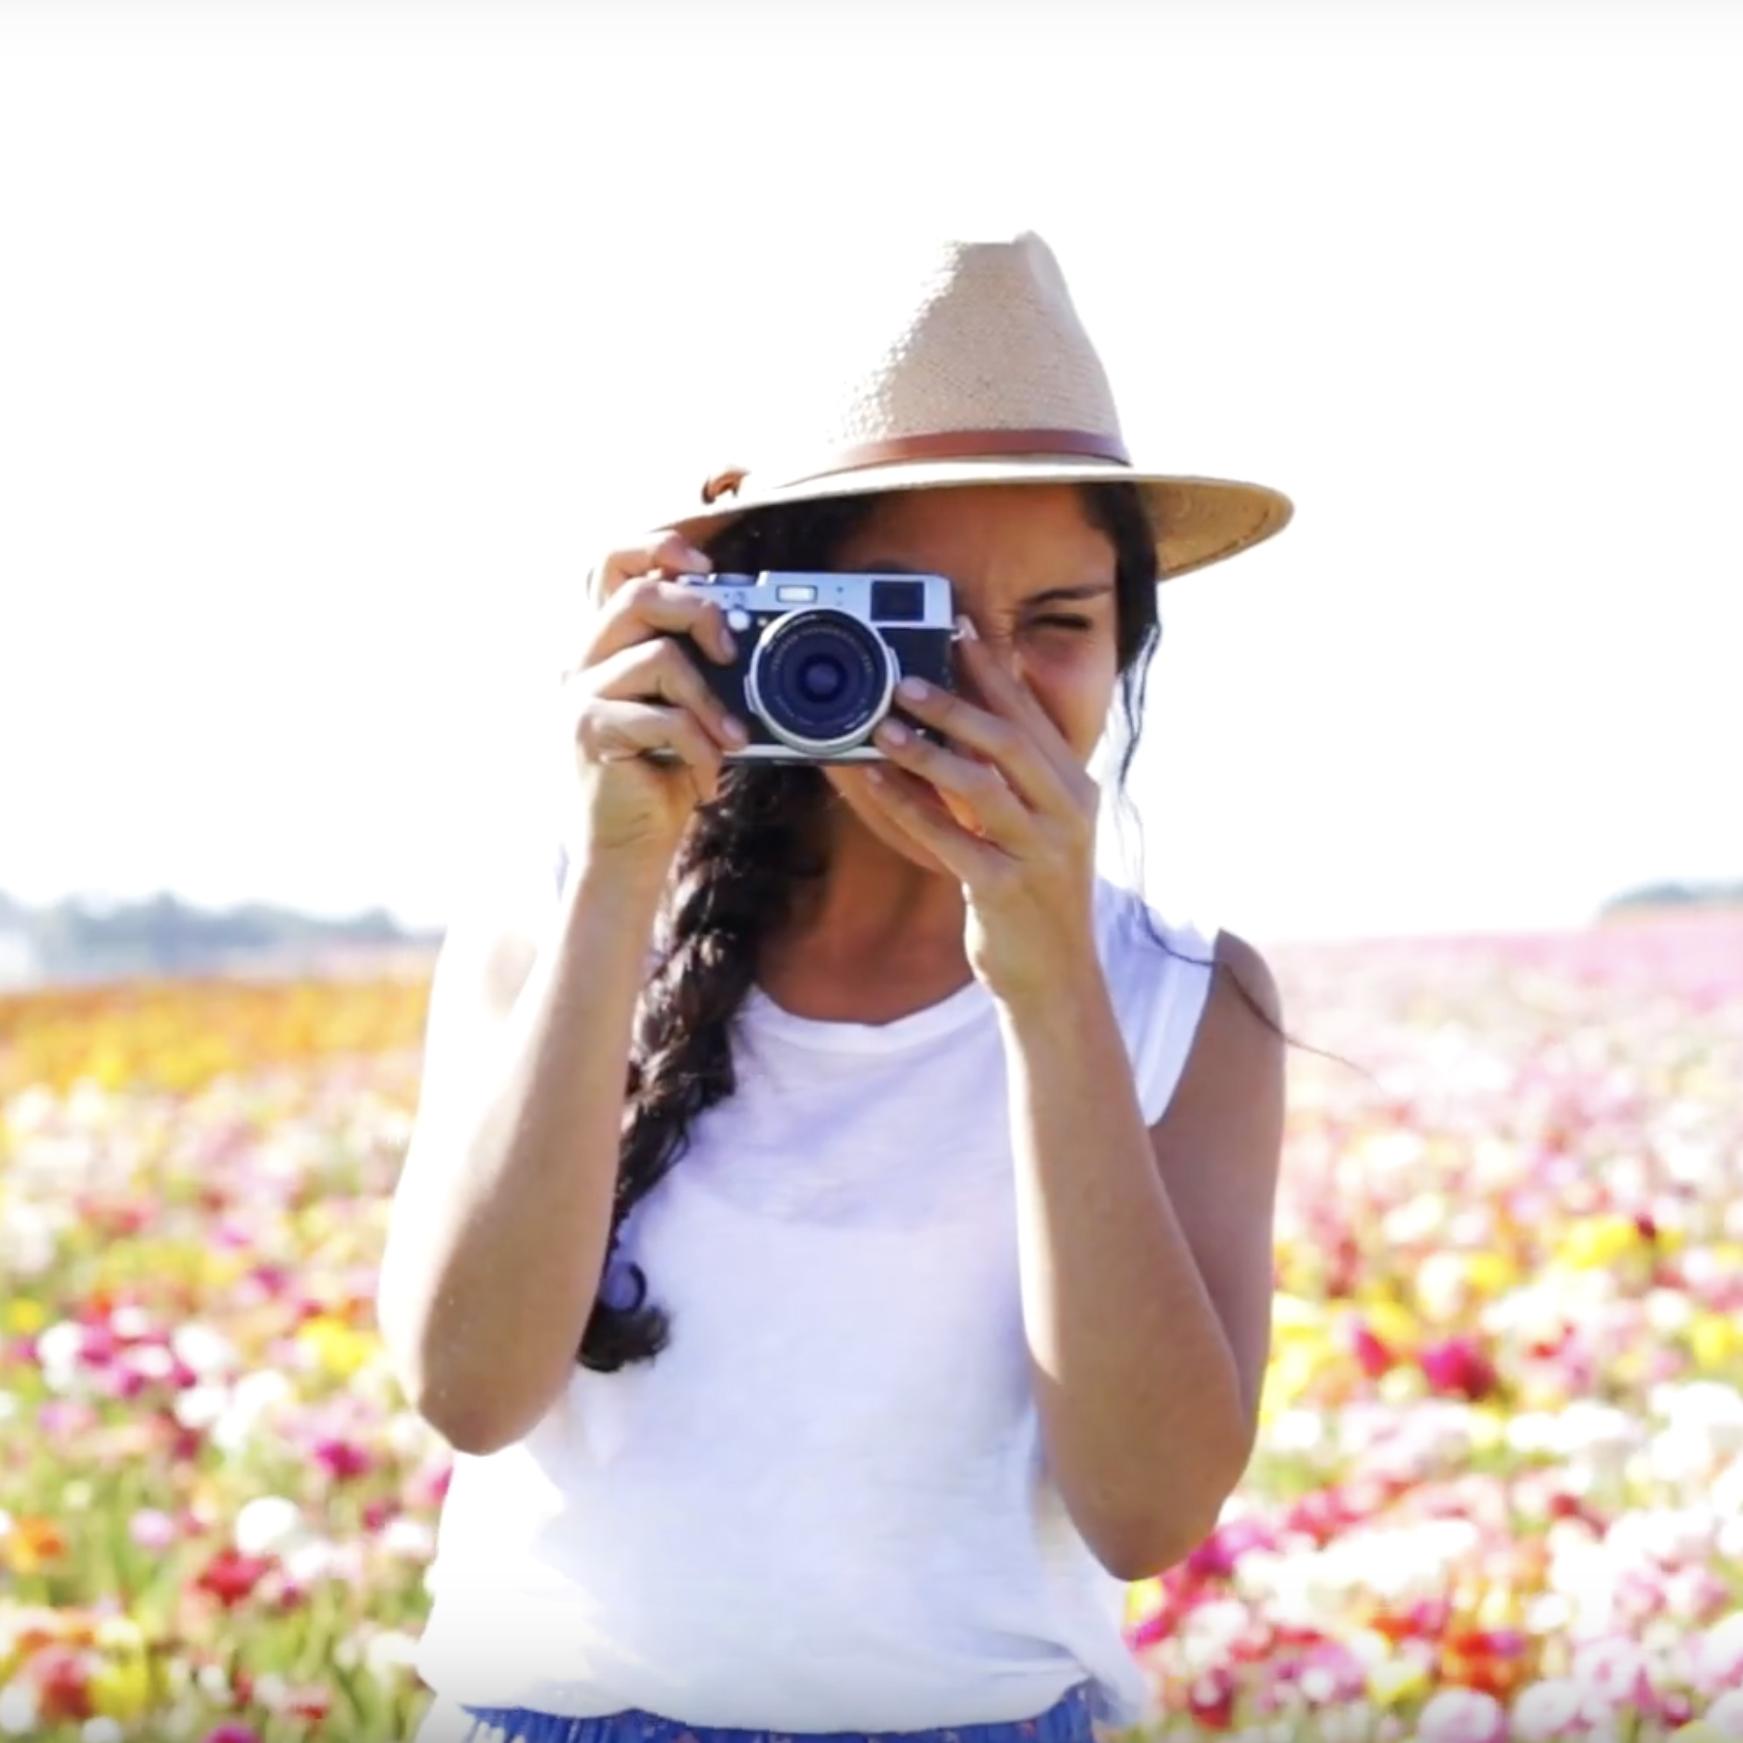 karla-diaz-cano-flowers.jpg